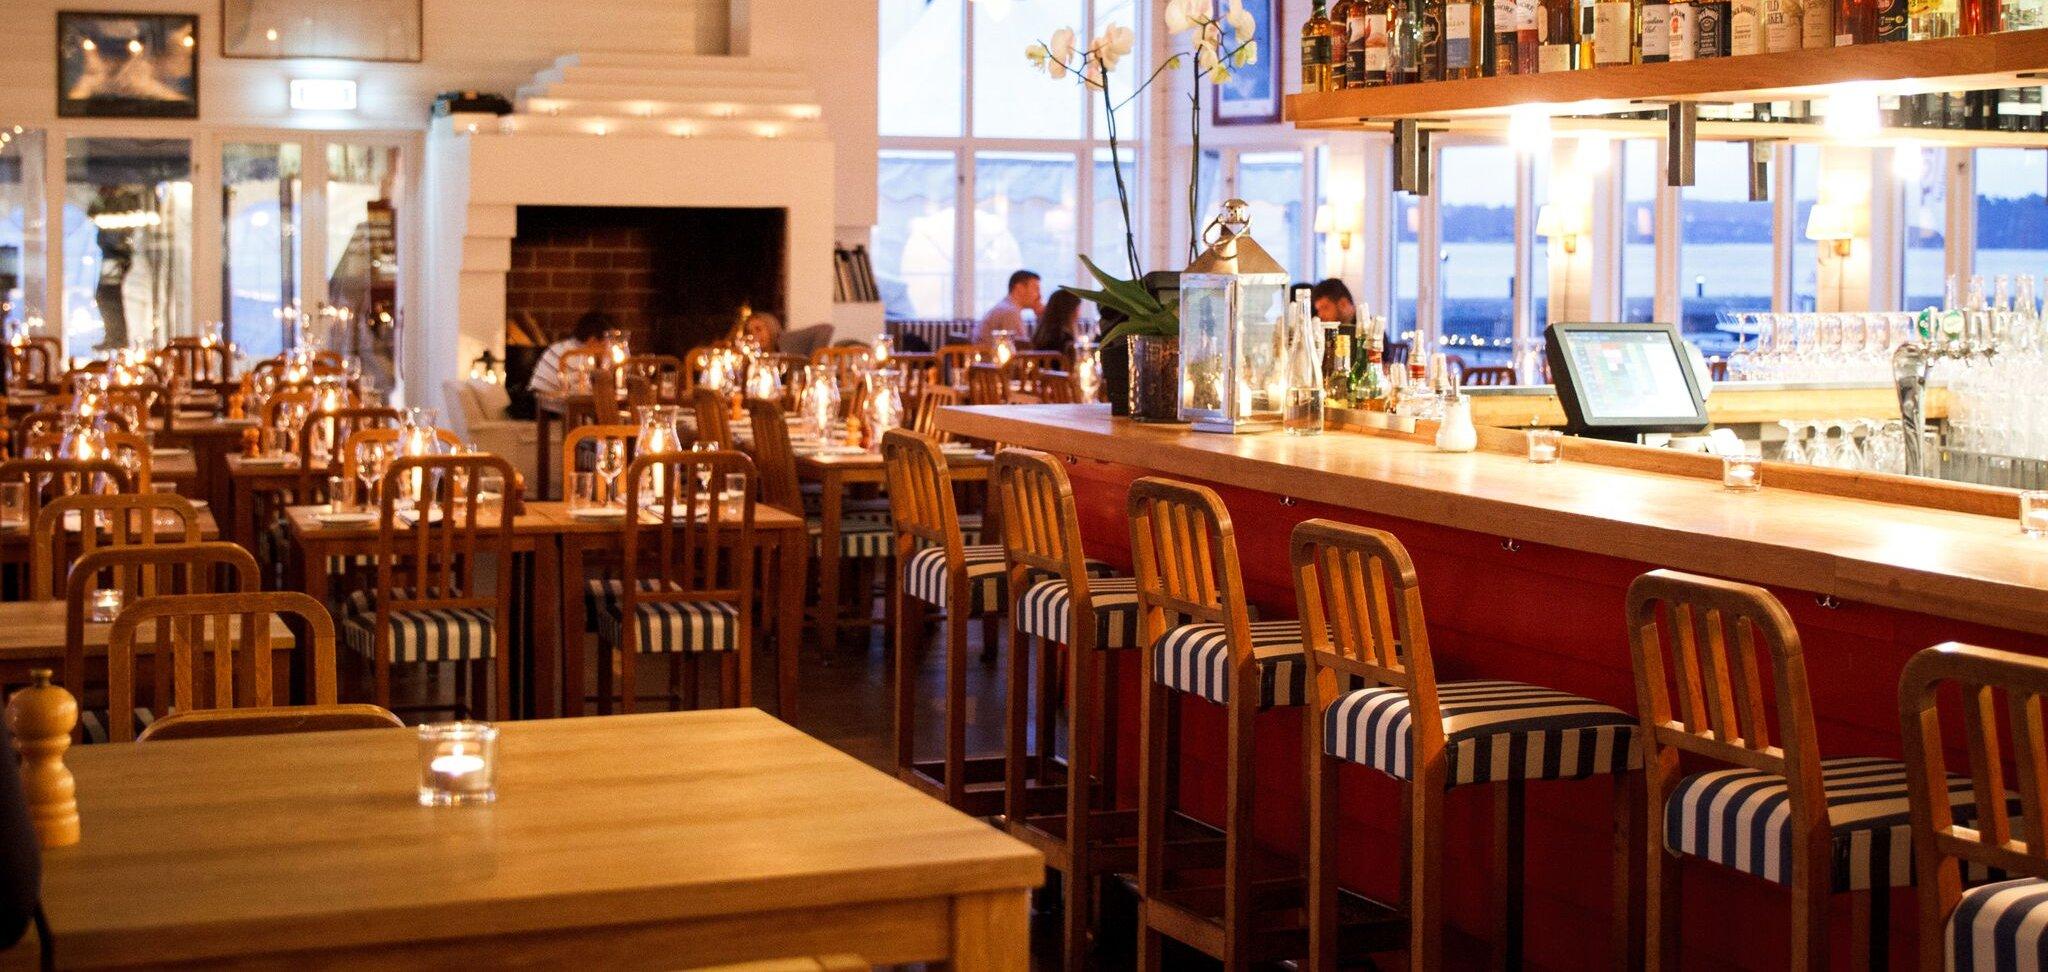 restaurant-j-interior-stockholm